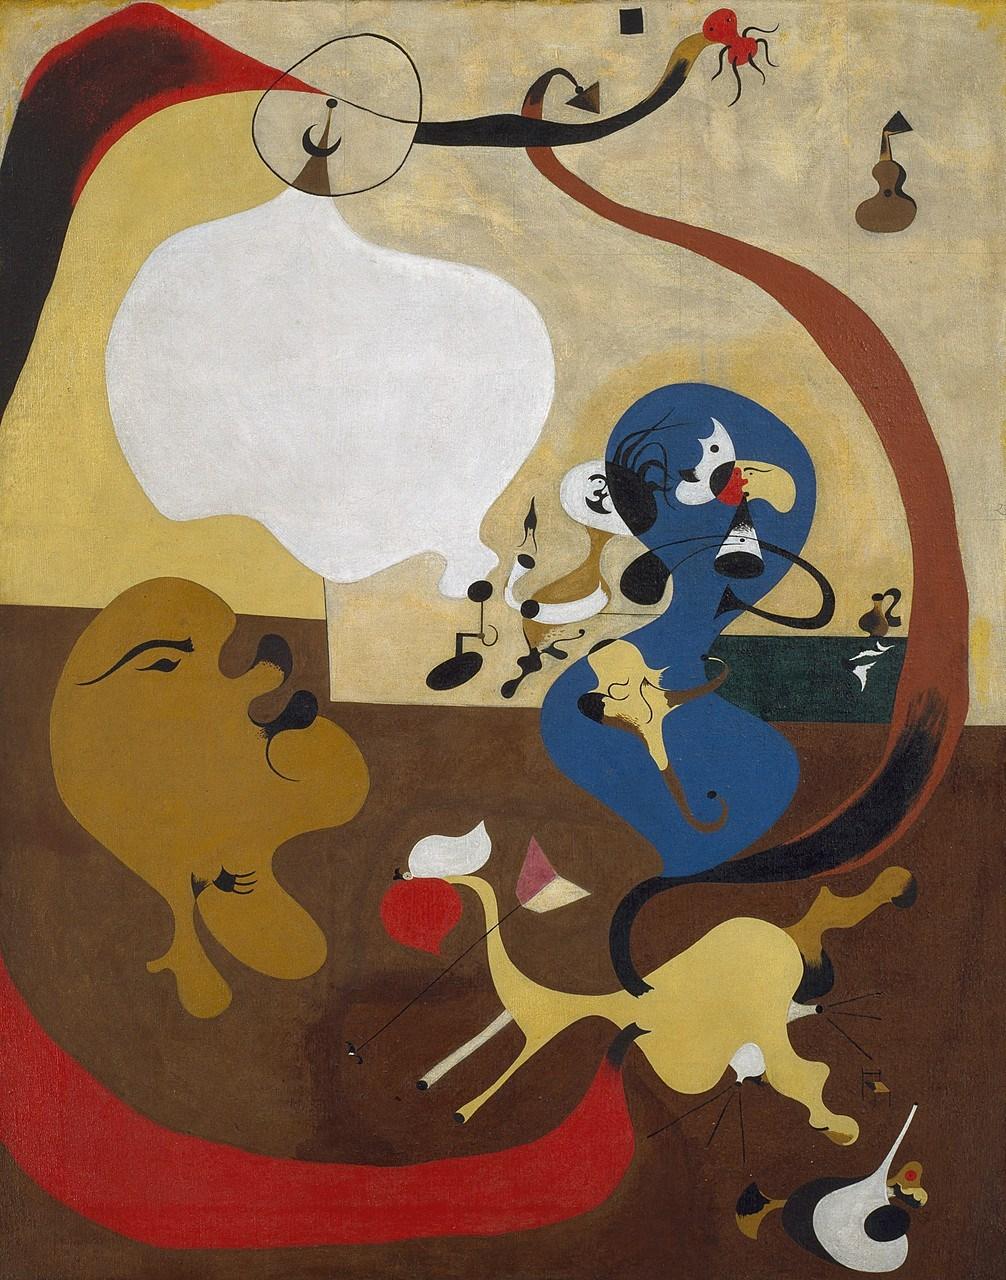 JOAN MIRÓ - Dutch Interior II   The Solomon R. Guggenheim Foundation Peggy Guggenheim Collection, Venice, 1976  © 2018 Successió Miró/Artists Rights Society (ARS), New York/ADAGP, Paris